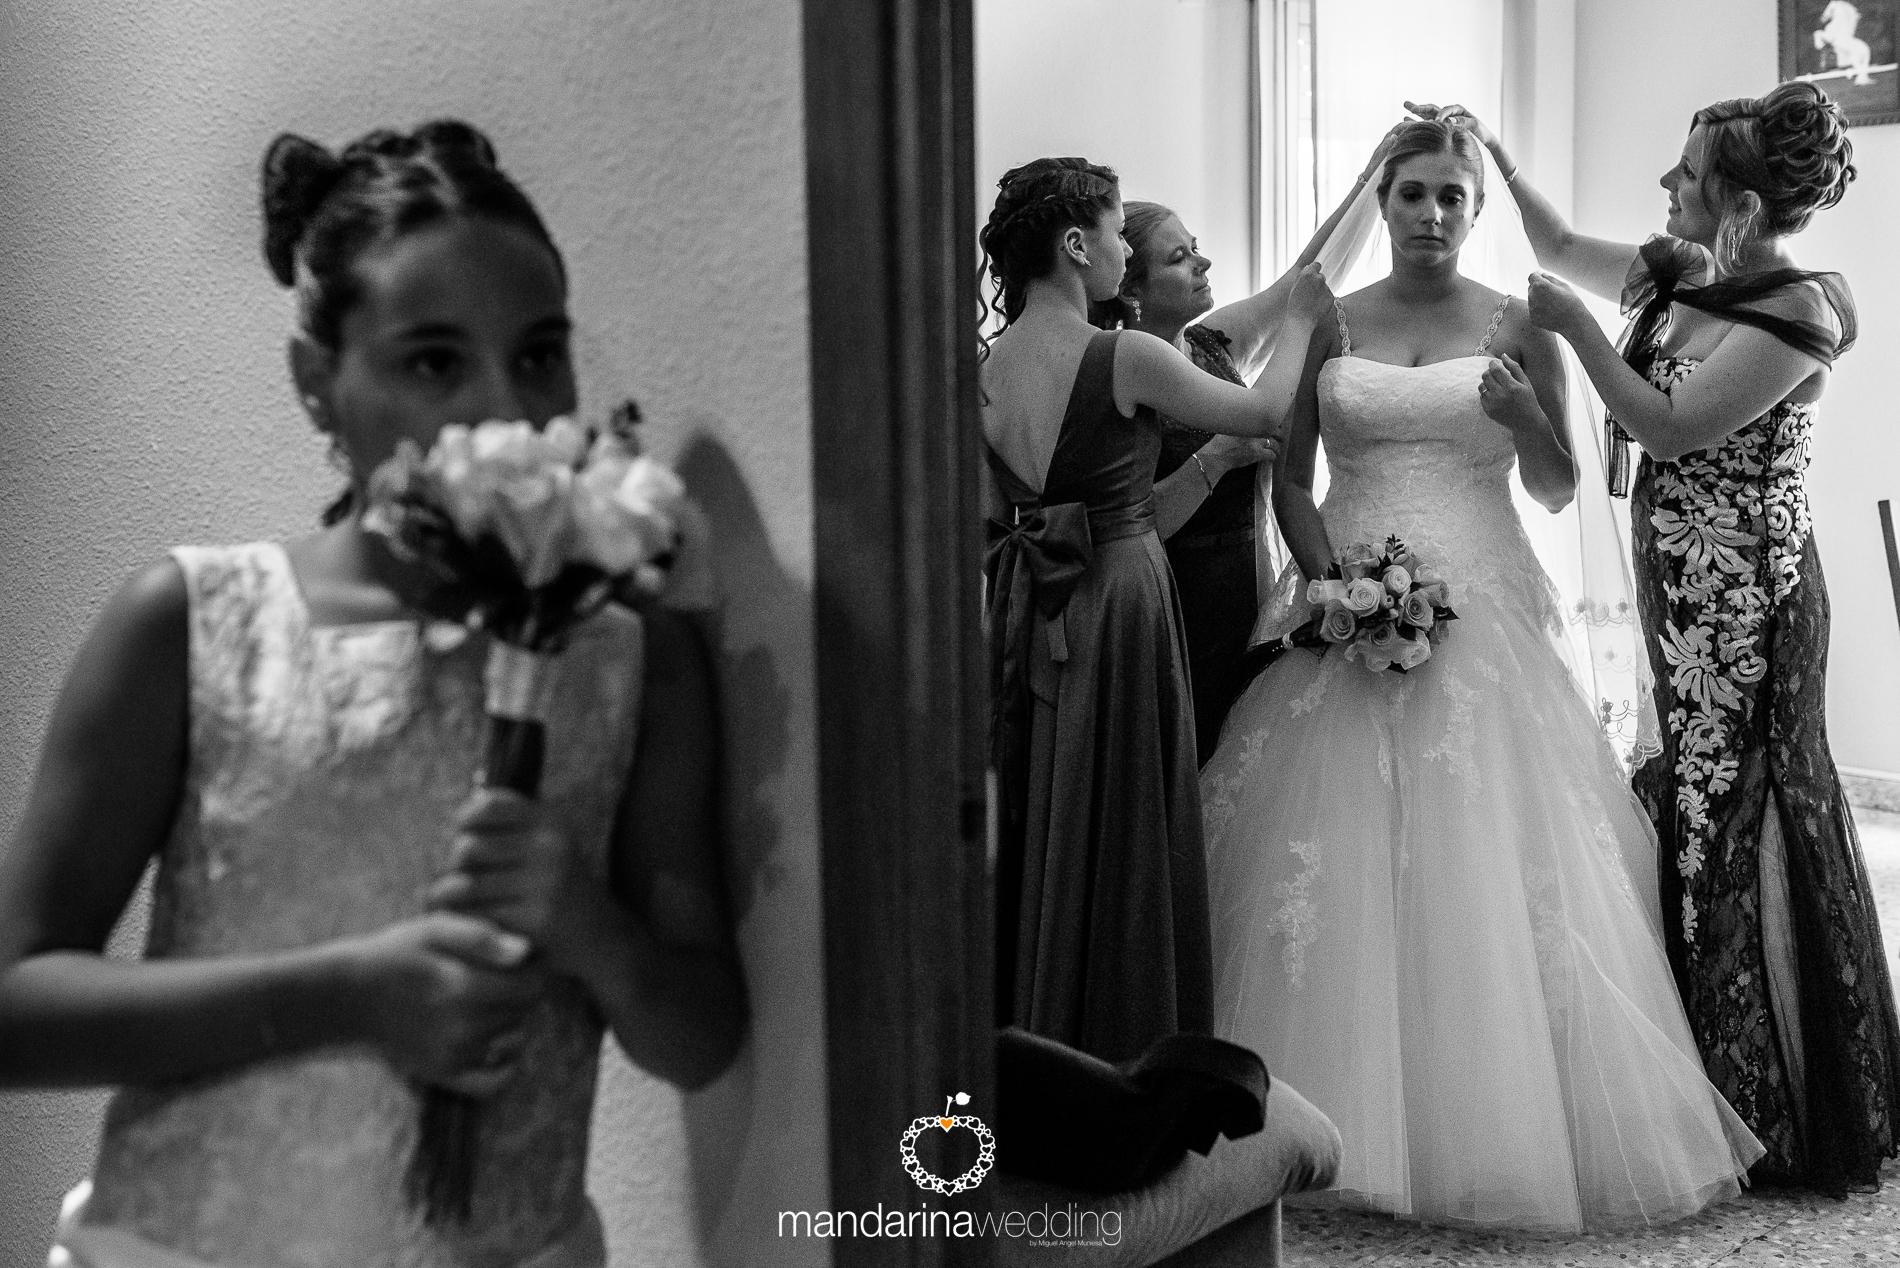 mandarina wedding, mejores fotografos boda, fotografo zaragoza, fotografo huesca, fotografo soria, fotografo lerida_49